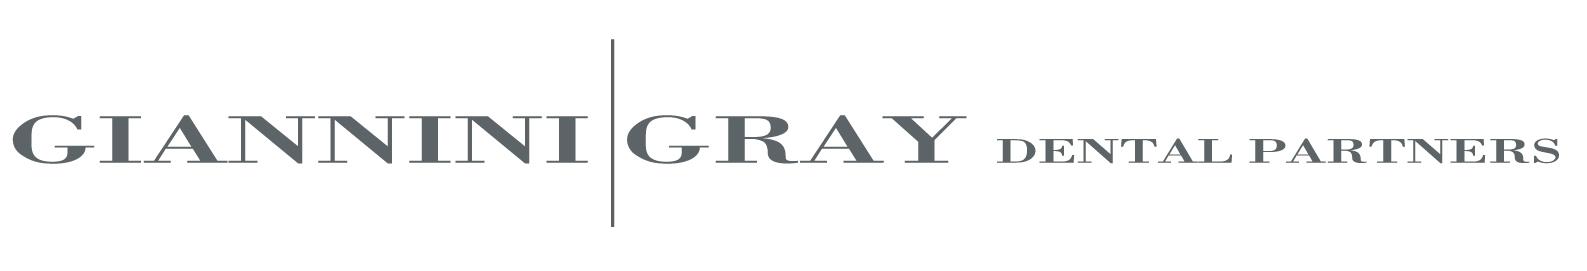 Giannini Gray Dental Partners reviews | 4801 Wisconsin Ave NW - Washington DC